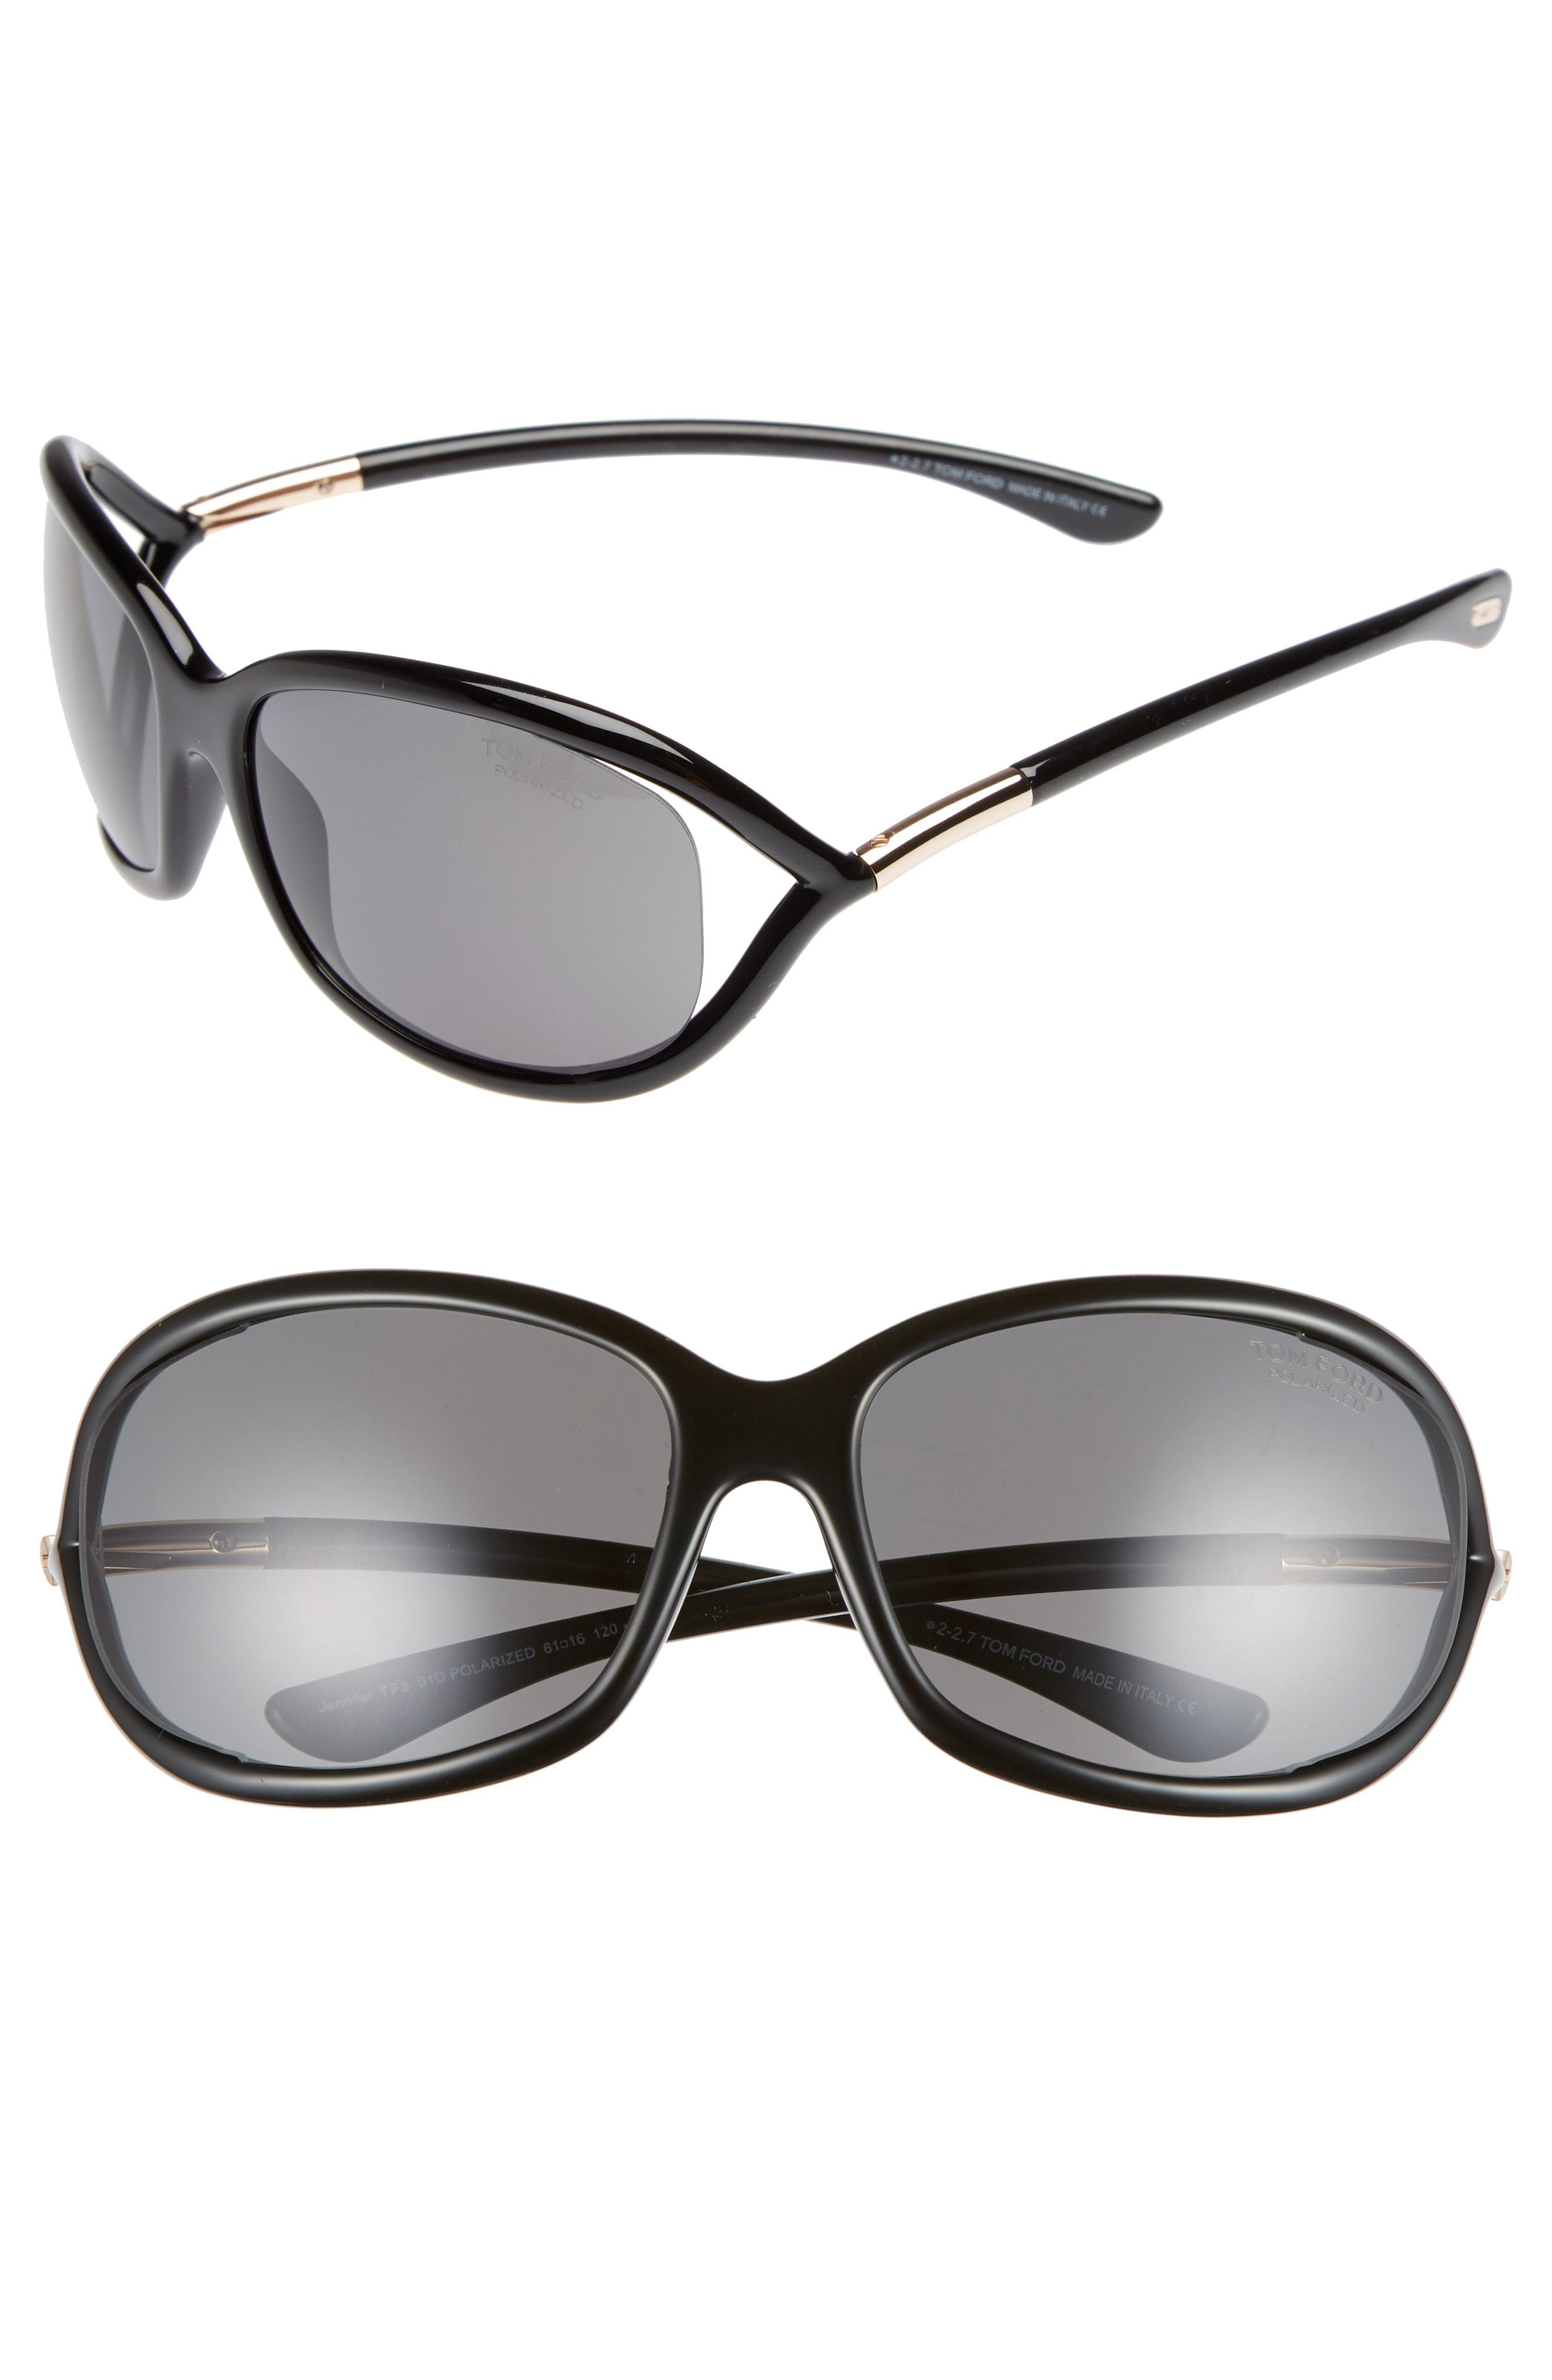 7b9d2a19f7 Tom Ford. Women s Jennifer 61mm Polarized Open Temple Sunglasses ...